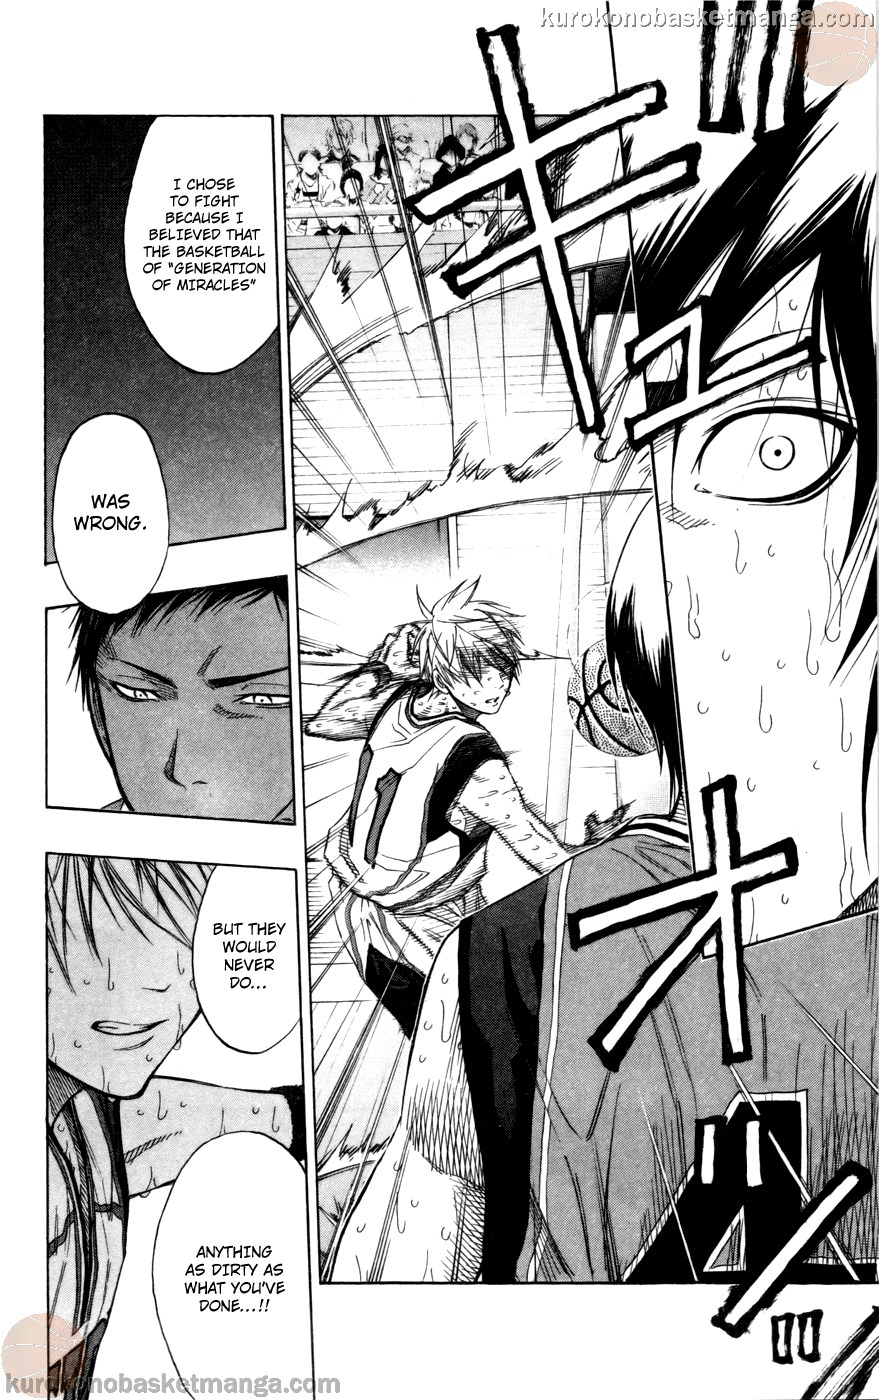 Kuroko no Basket Manga Chapter 107 - Image 10